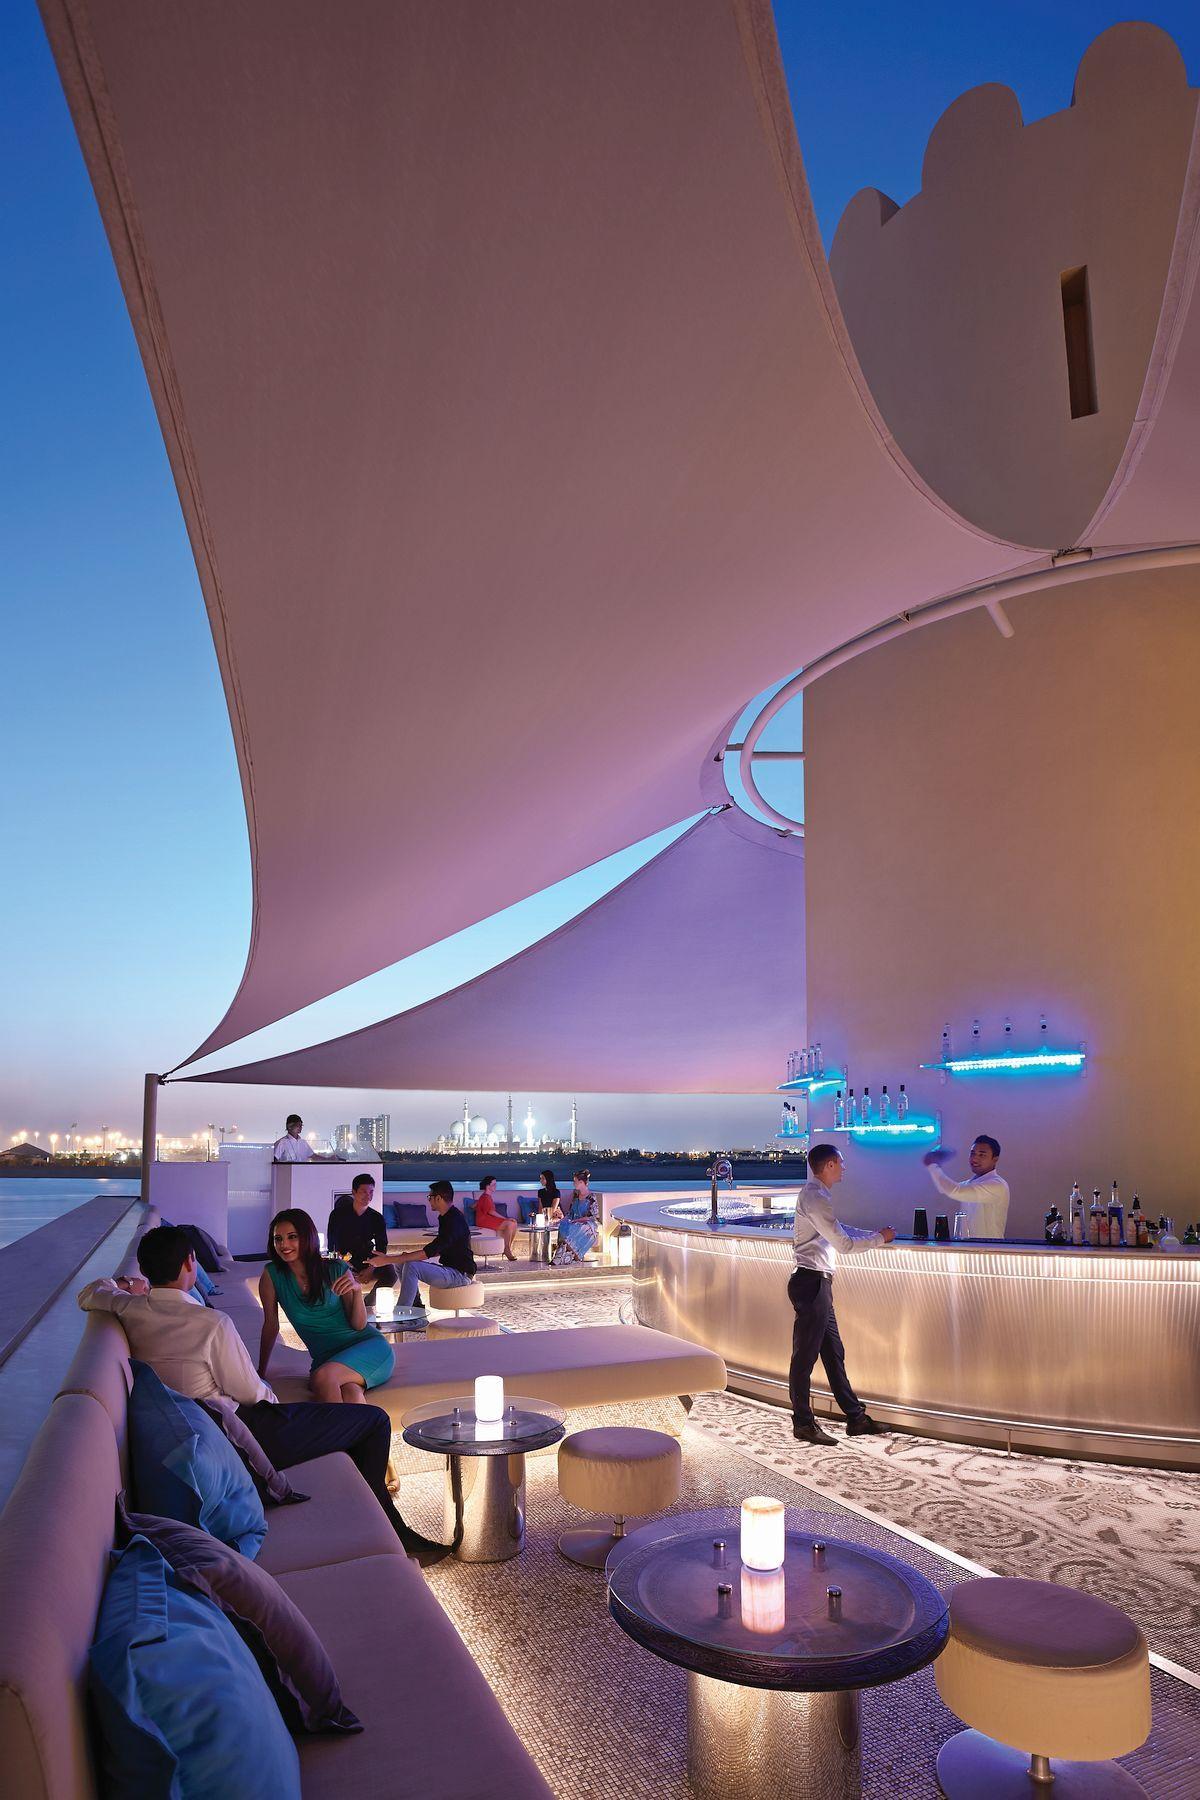 Shangri La Hotel Qaryat Al Beri Abu Dhabi A Rooftop